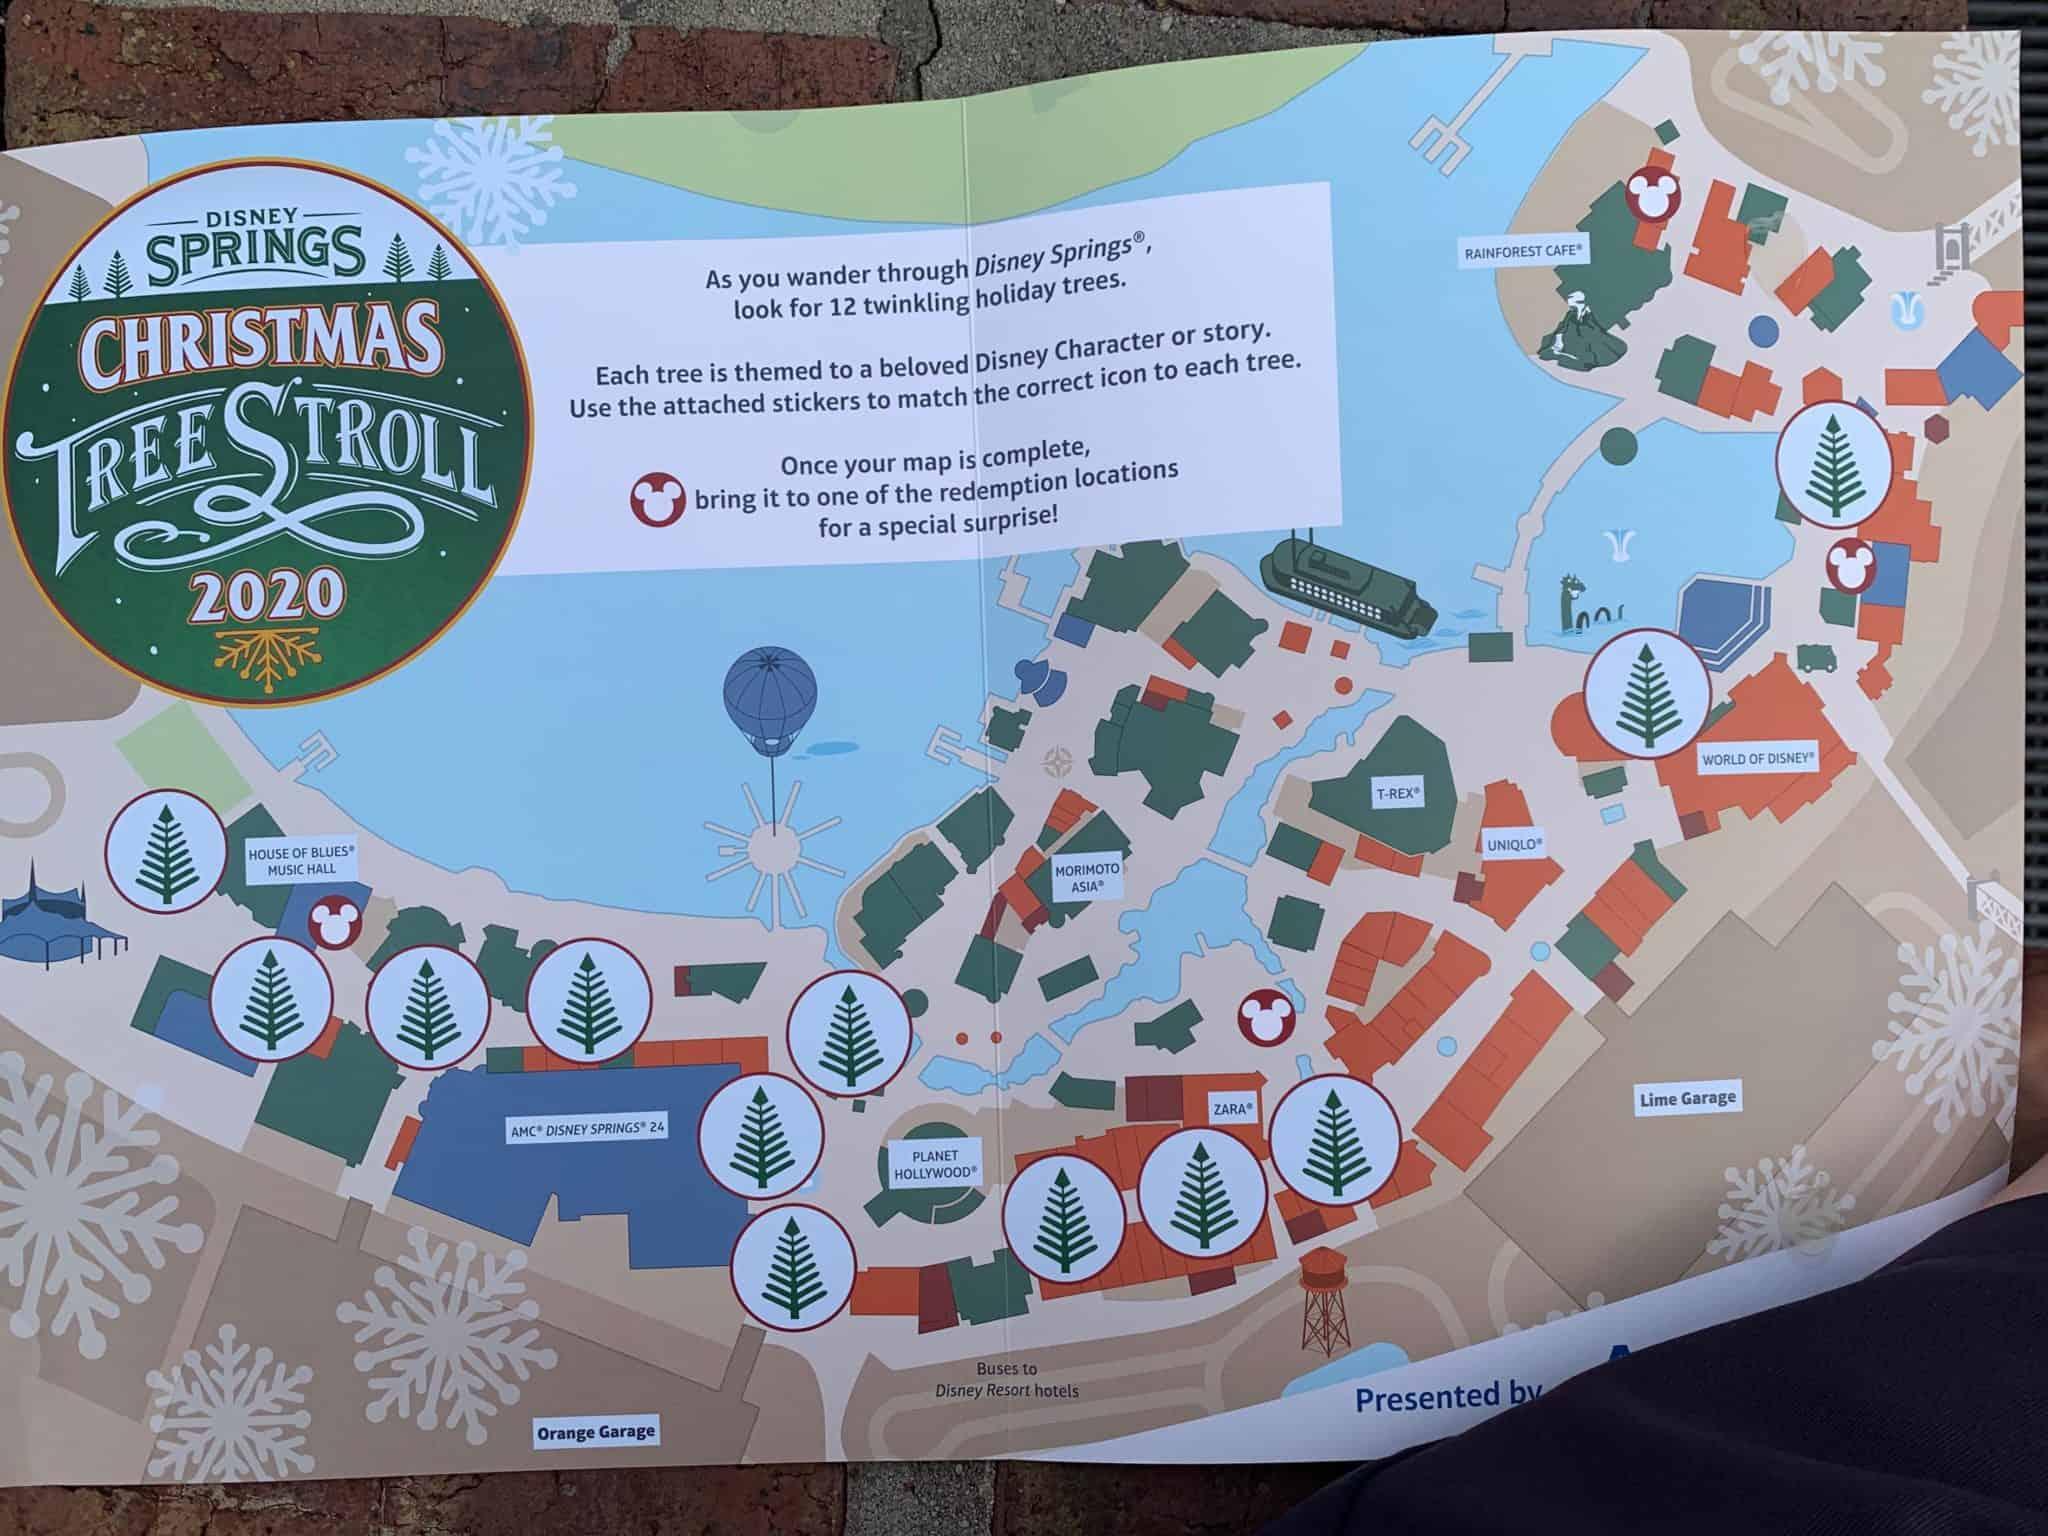 christmas tree stroll disney springs 2020 map